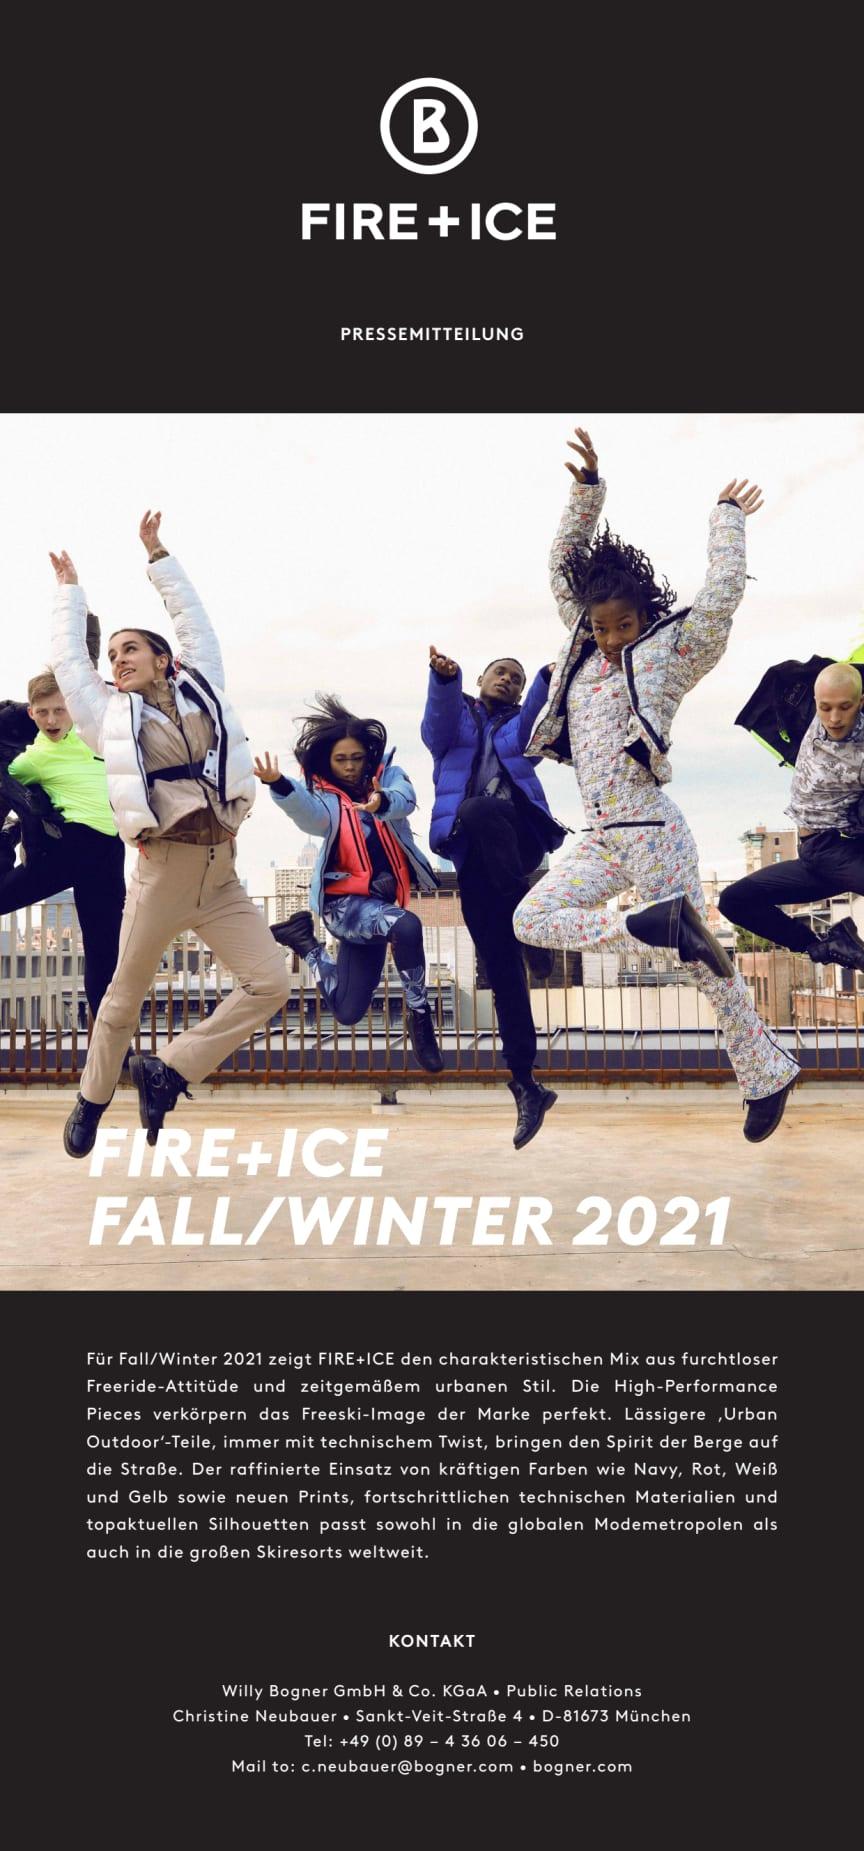 FIRE+ICE Fall/Winter 2021